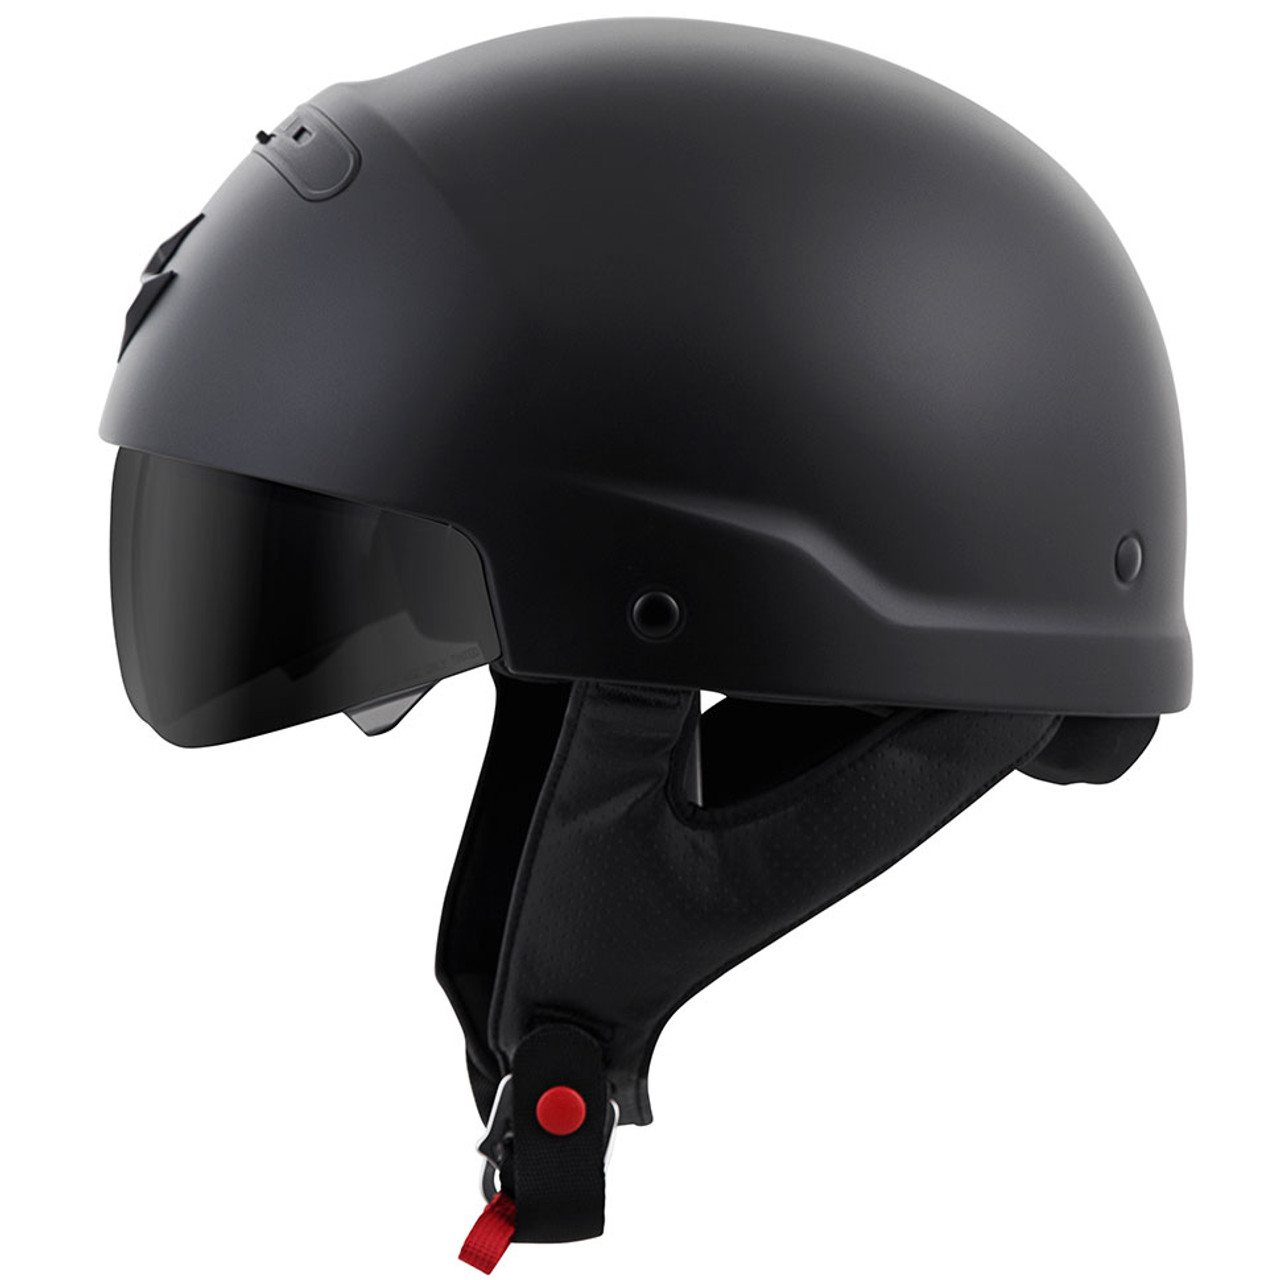 c19844aa Scorpion Covert Convertible Modular Motorcycle Helmet - Get Lowered ...